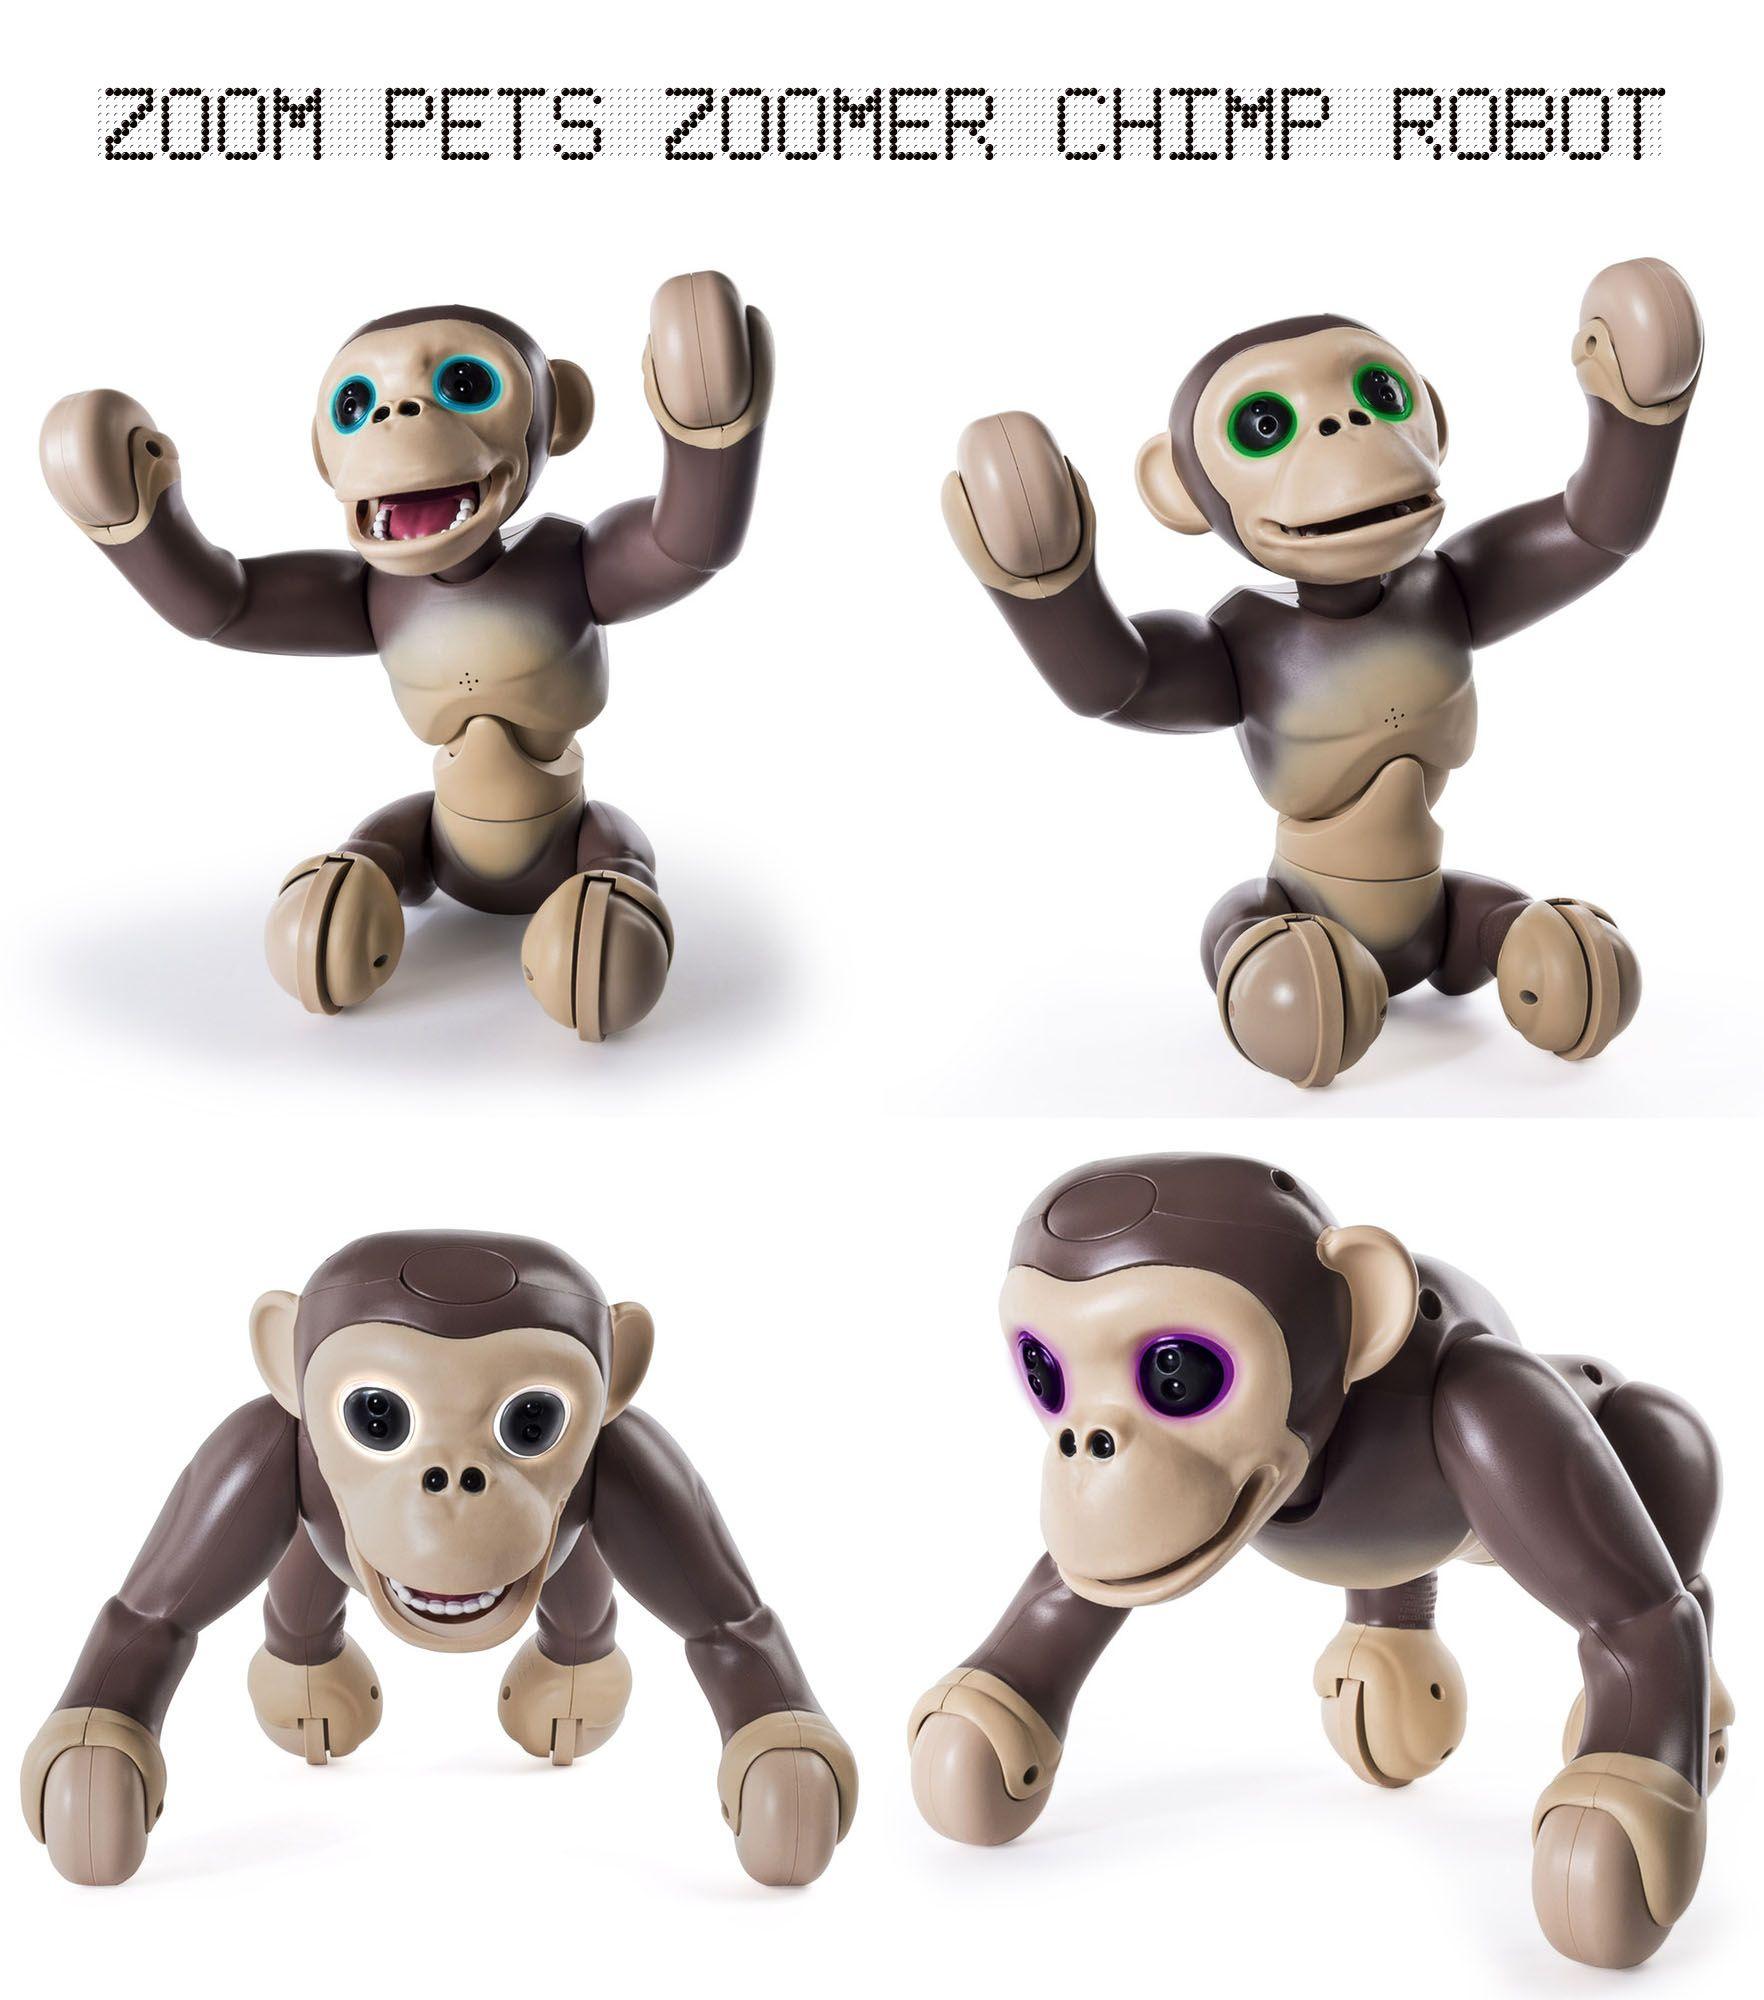 Zoom Pets Zoomer Chimp Robot ad toys chimp Chimpanzee